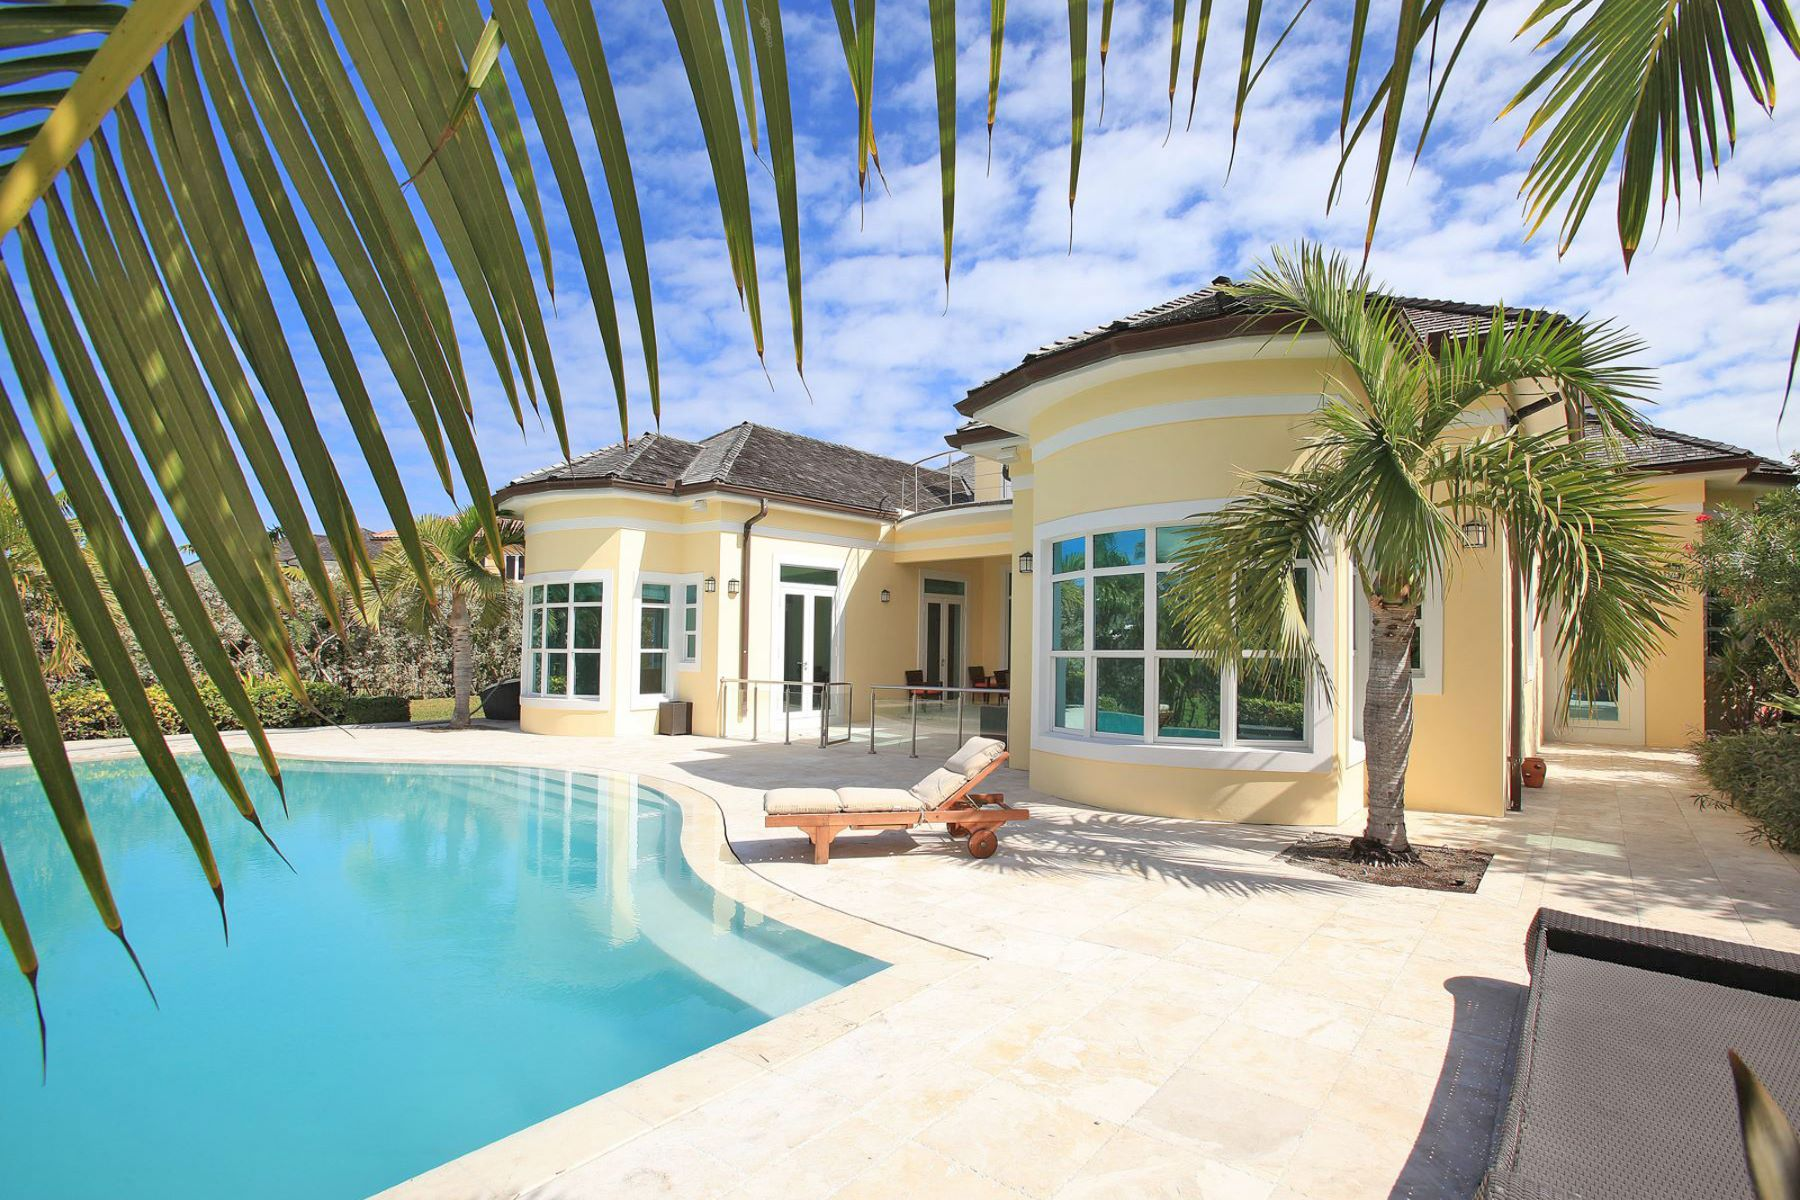 Additional photo for property listing at Ocean Club Estates #22 Ocean Club Estates, 天堂岛, 新普罗维登斯/拿骚 巴哈马